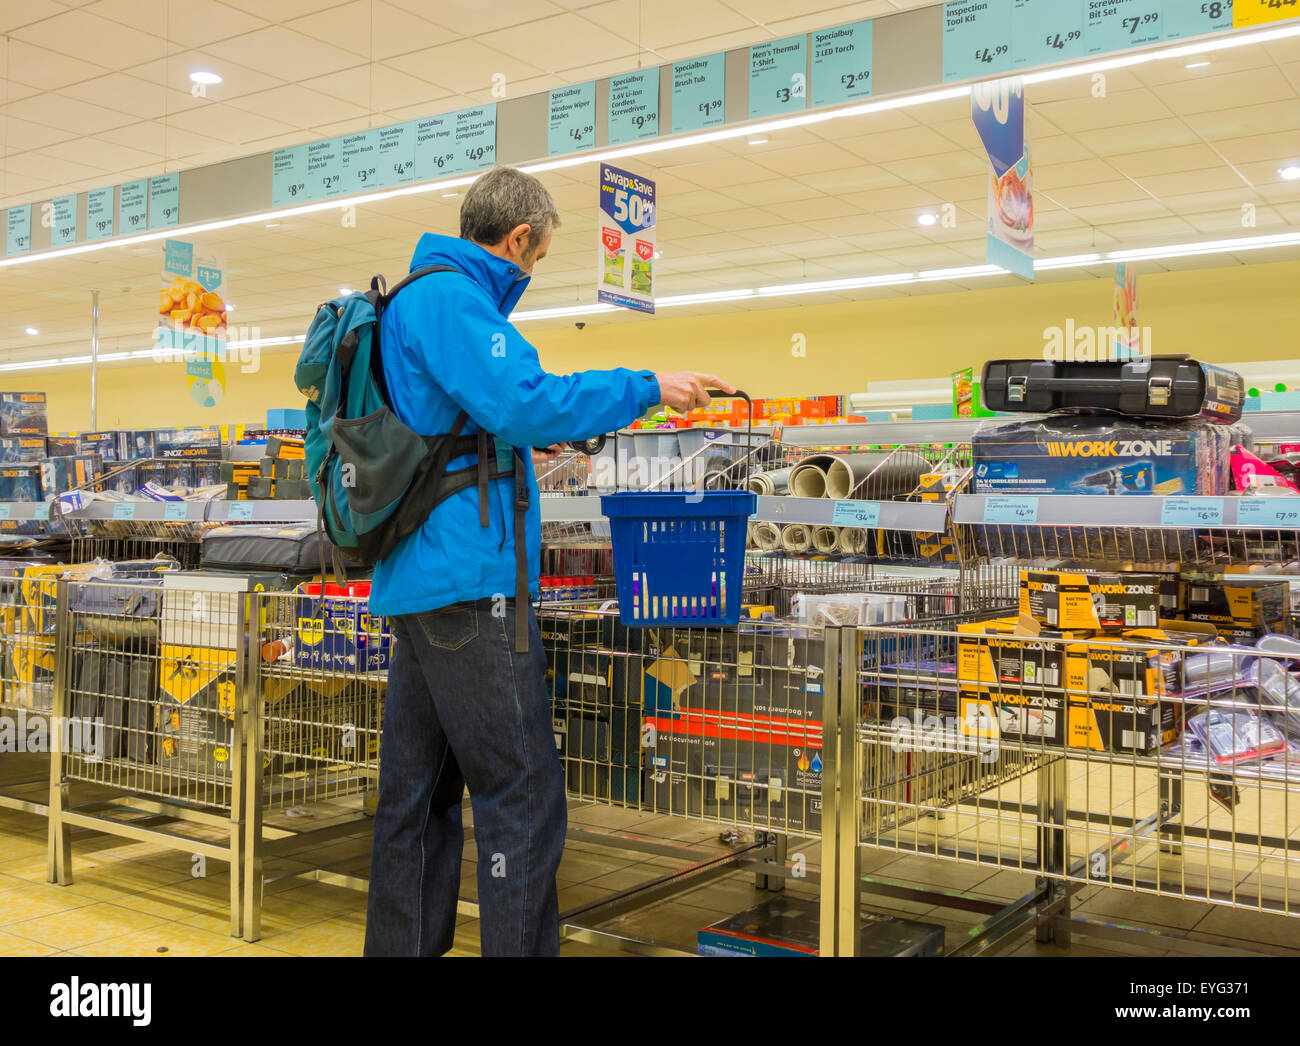 Mature man shopping in Aldi store. UK Stock Photo